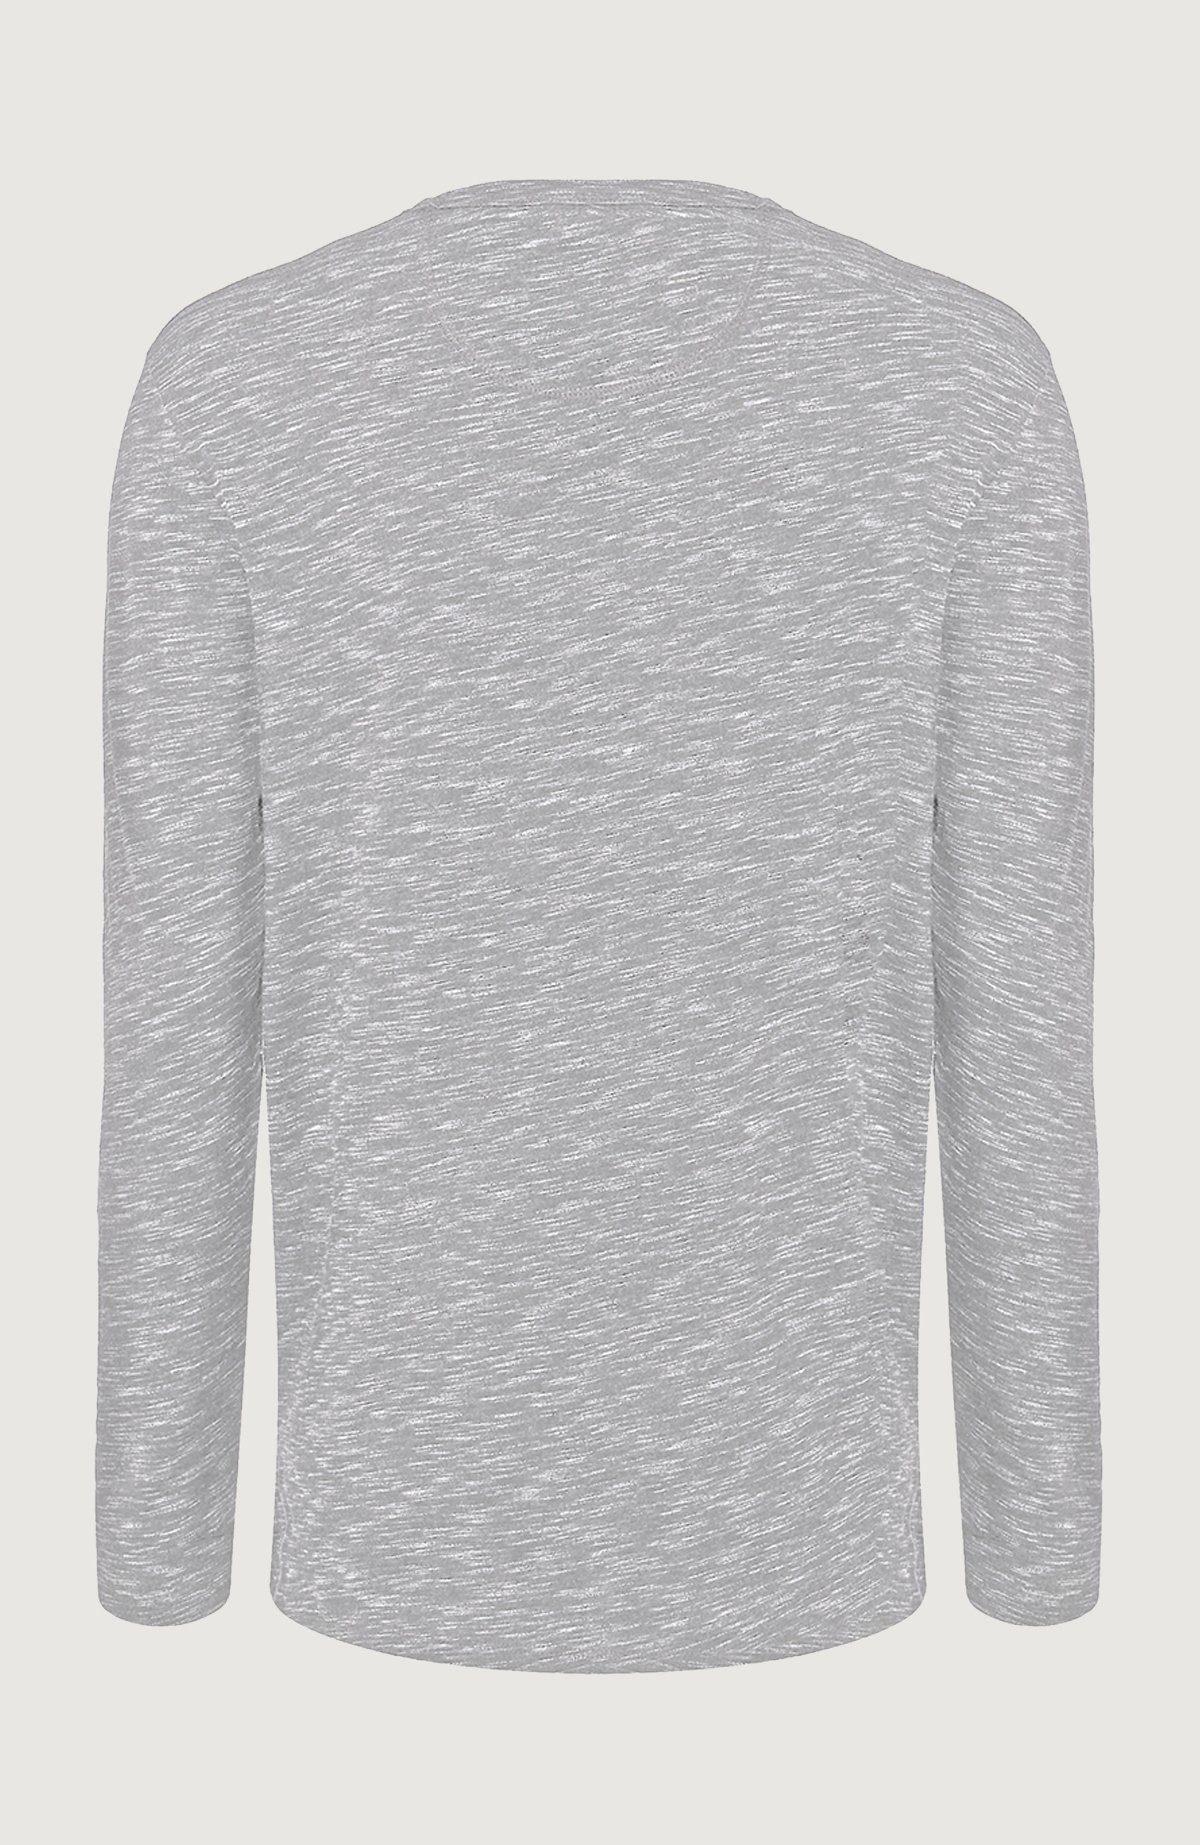 Online O'neill Langarmshirt Ess« Kaufen »special 0kwOXP8n